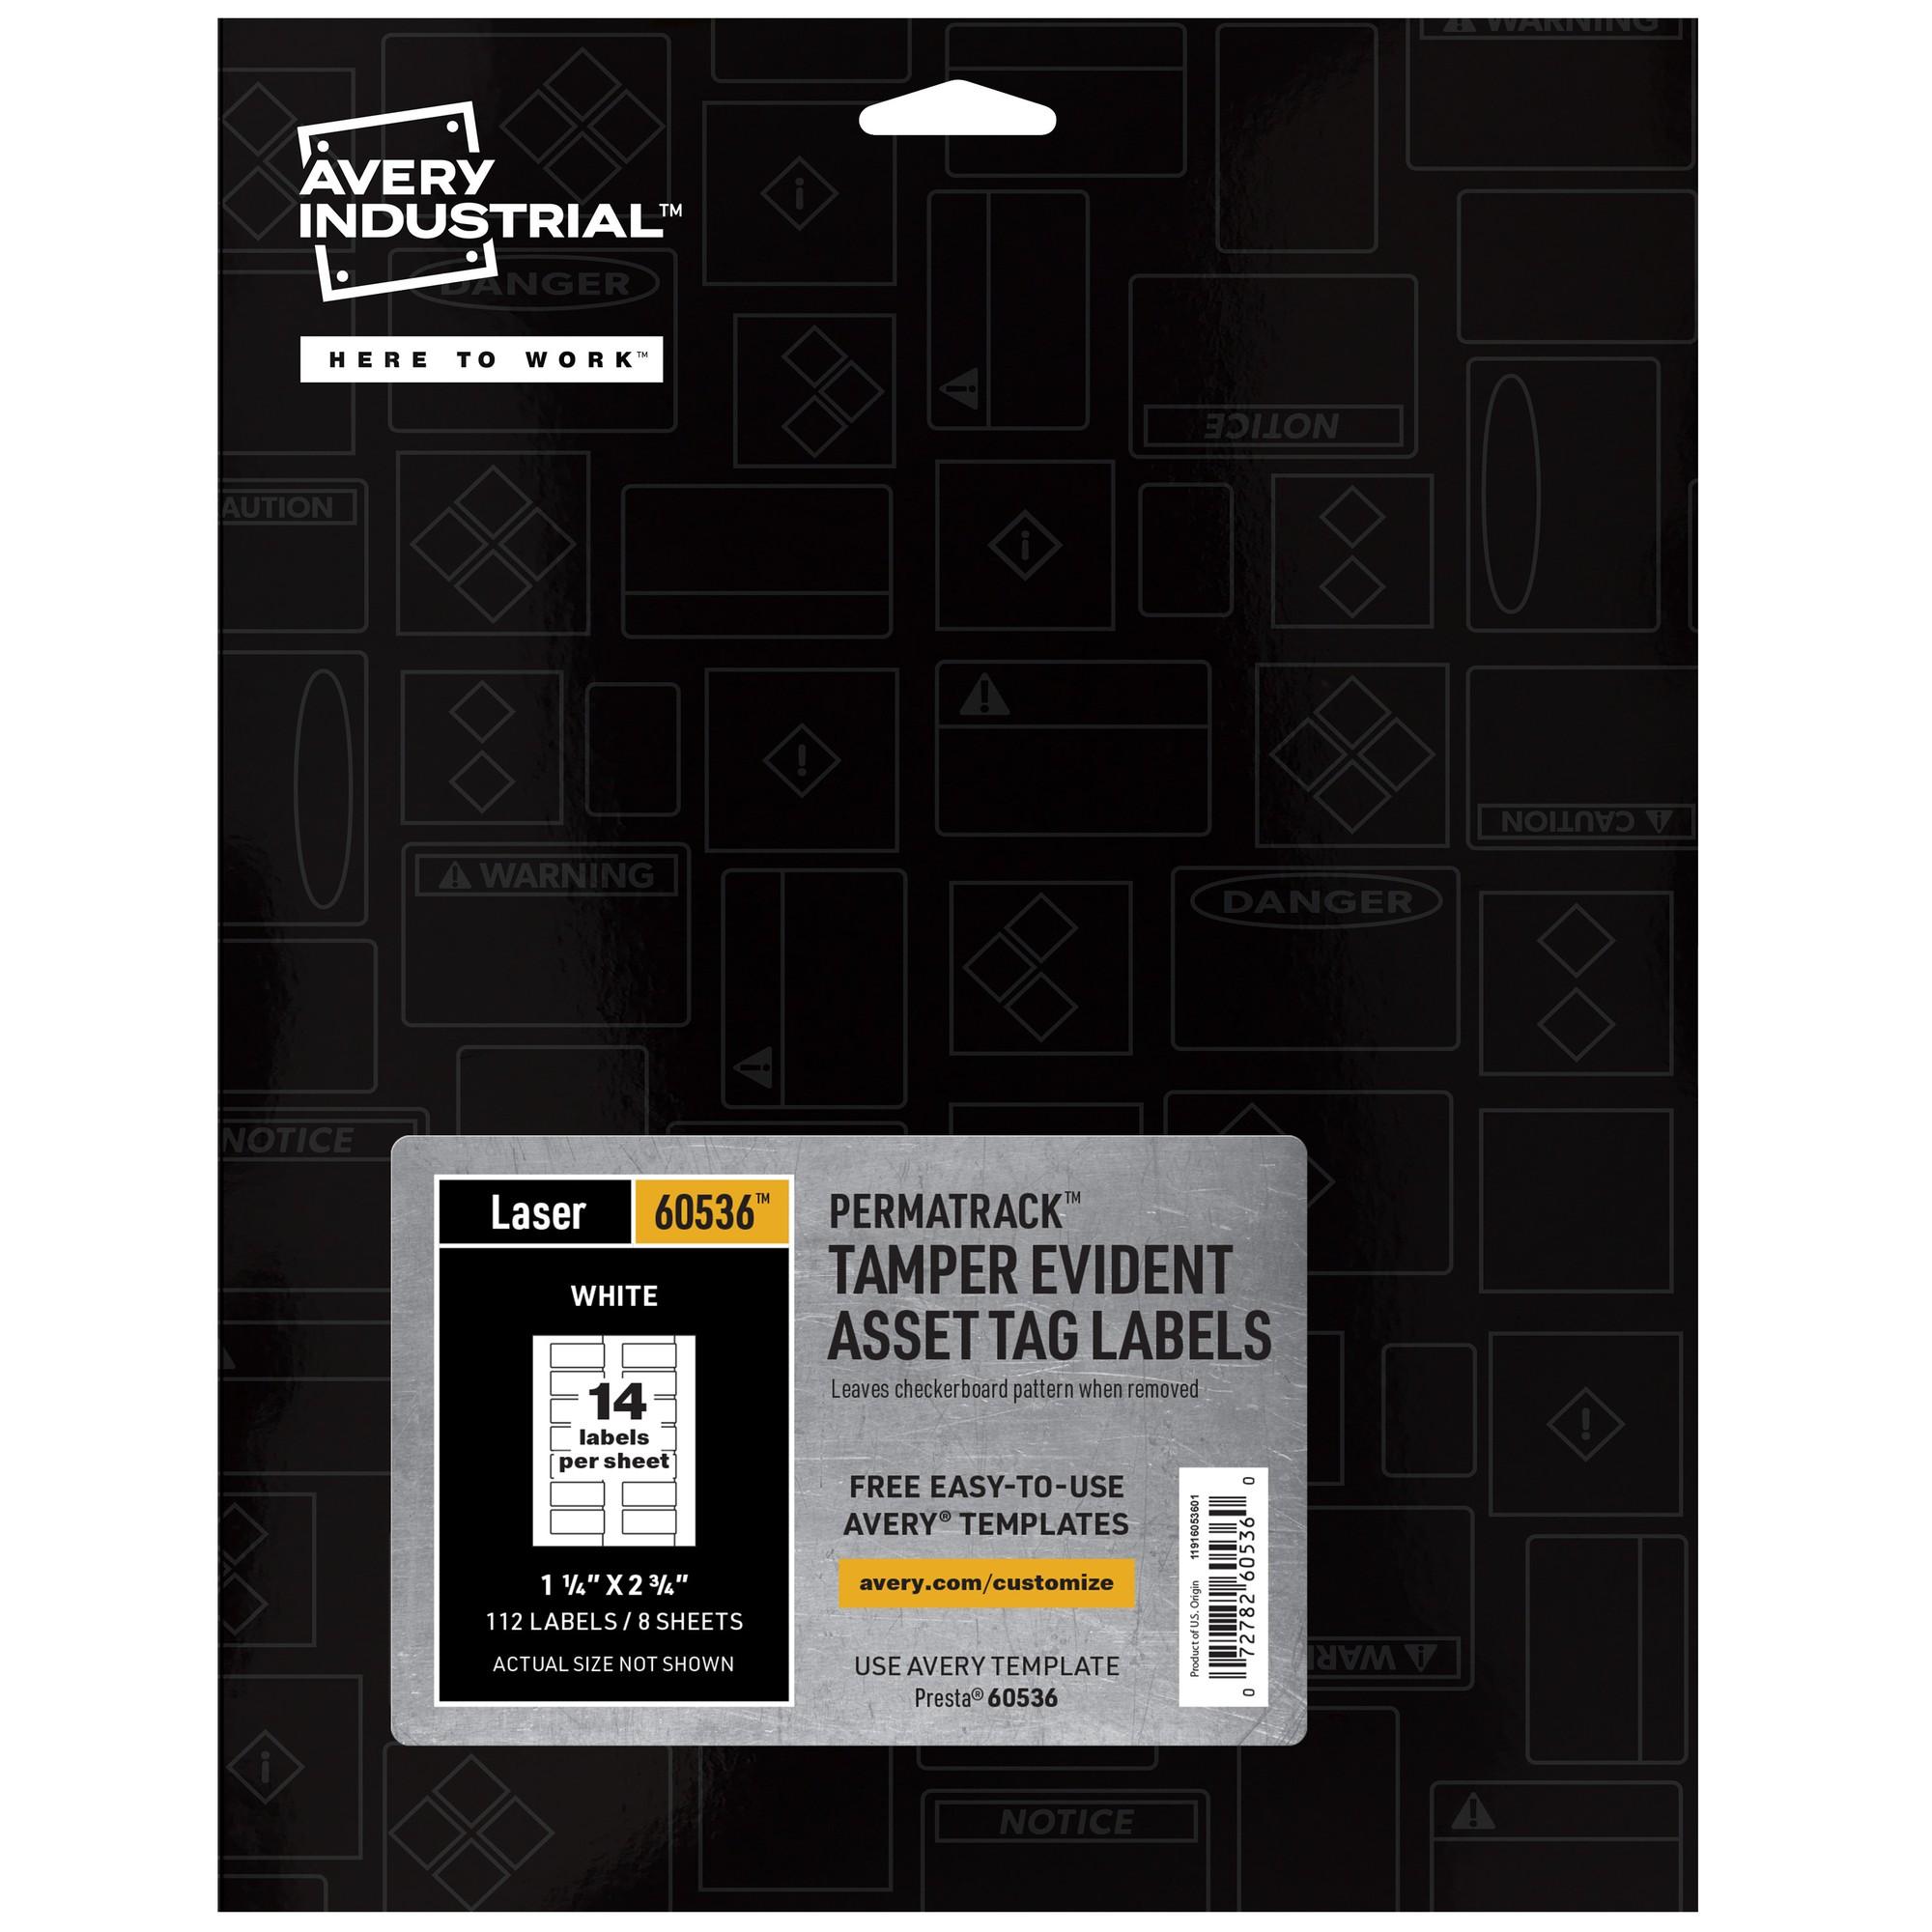 PermaTrack Tamper-Evident Asset Tag Labels, Laser Printers, 1.25 x 2.75, White, 14/Sheet, 8 Sheets/Pack